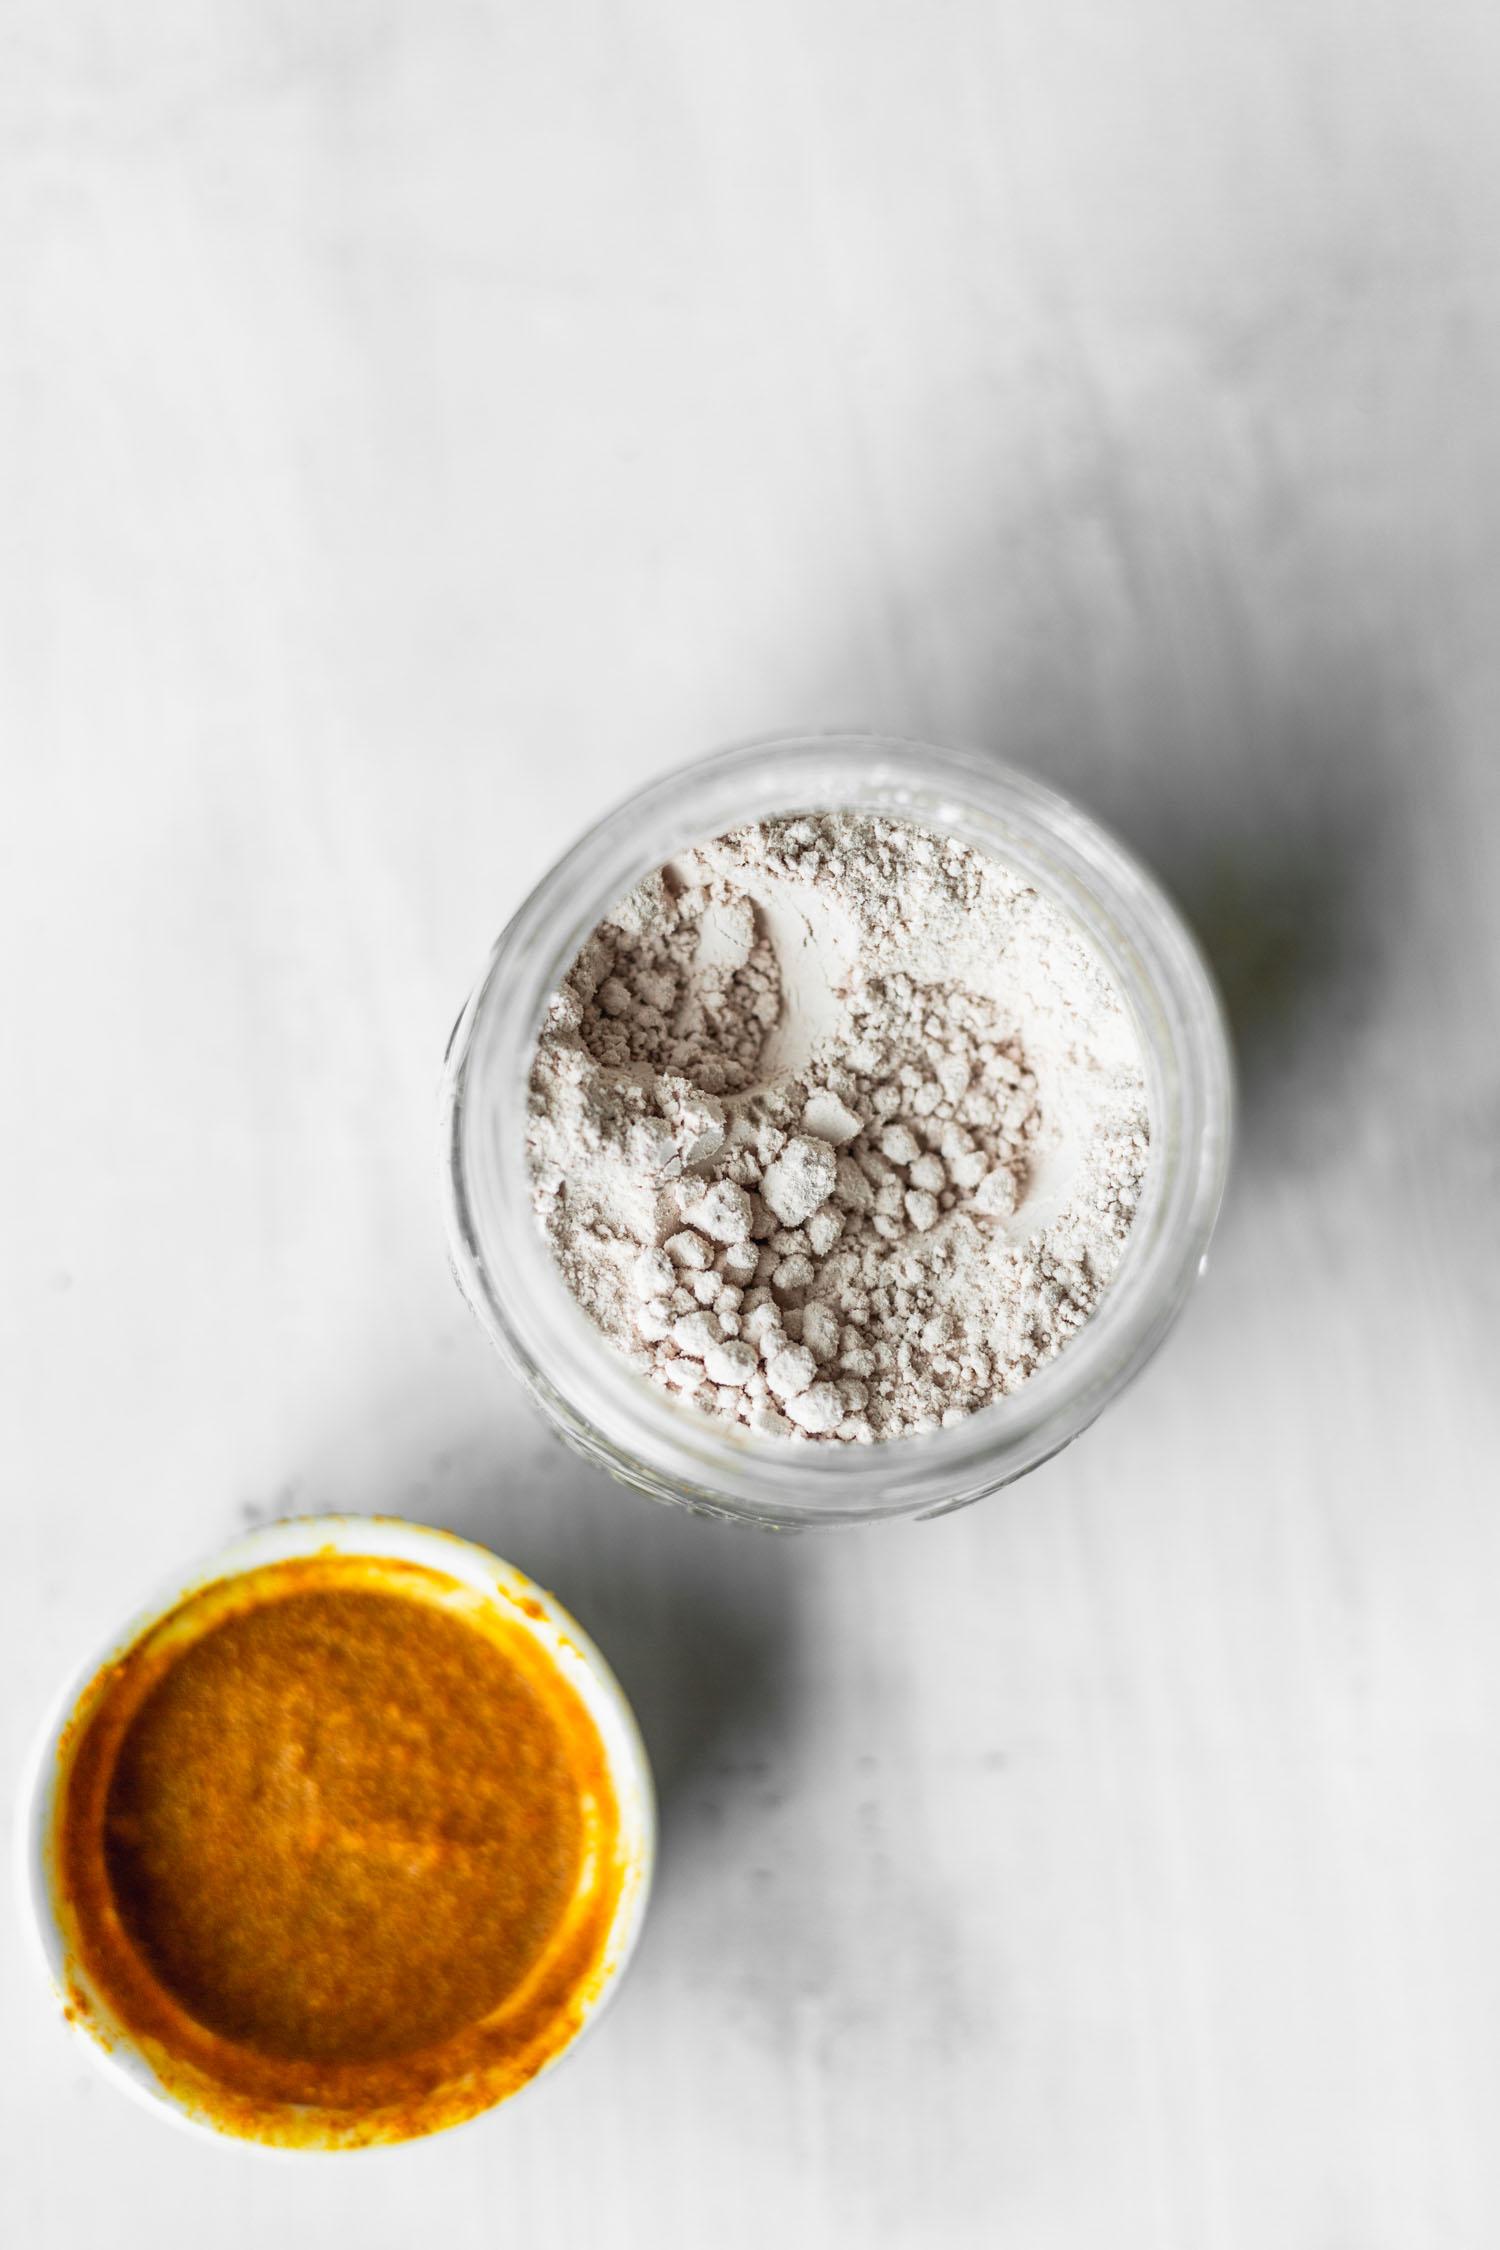 Kala Namak (black salt) and tofu scramble spice mix, Photo by Kari of Beautiful Ingredient.